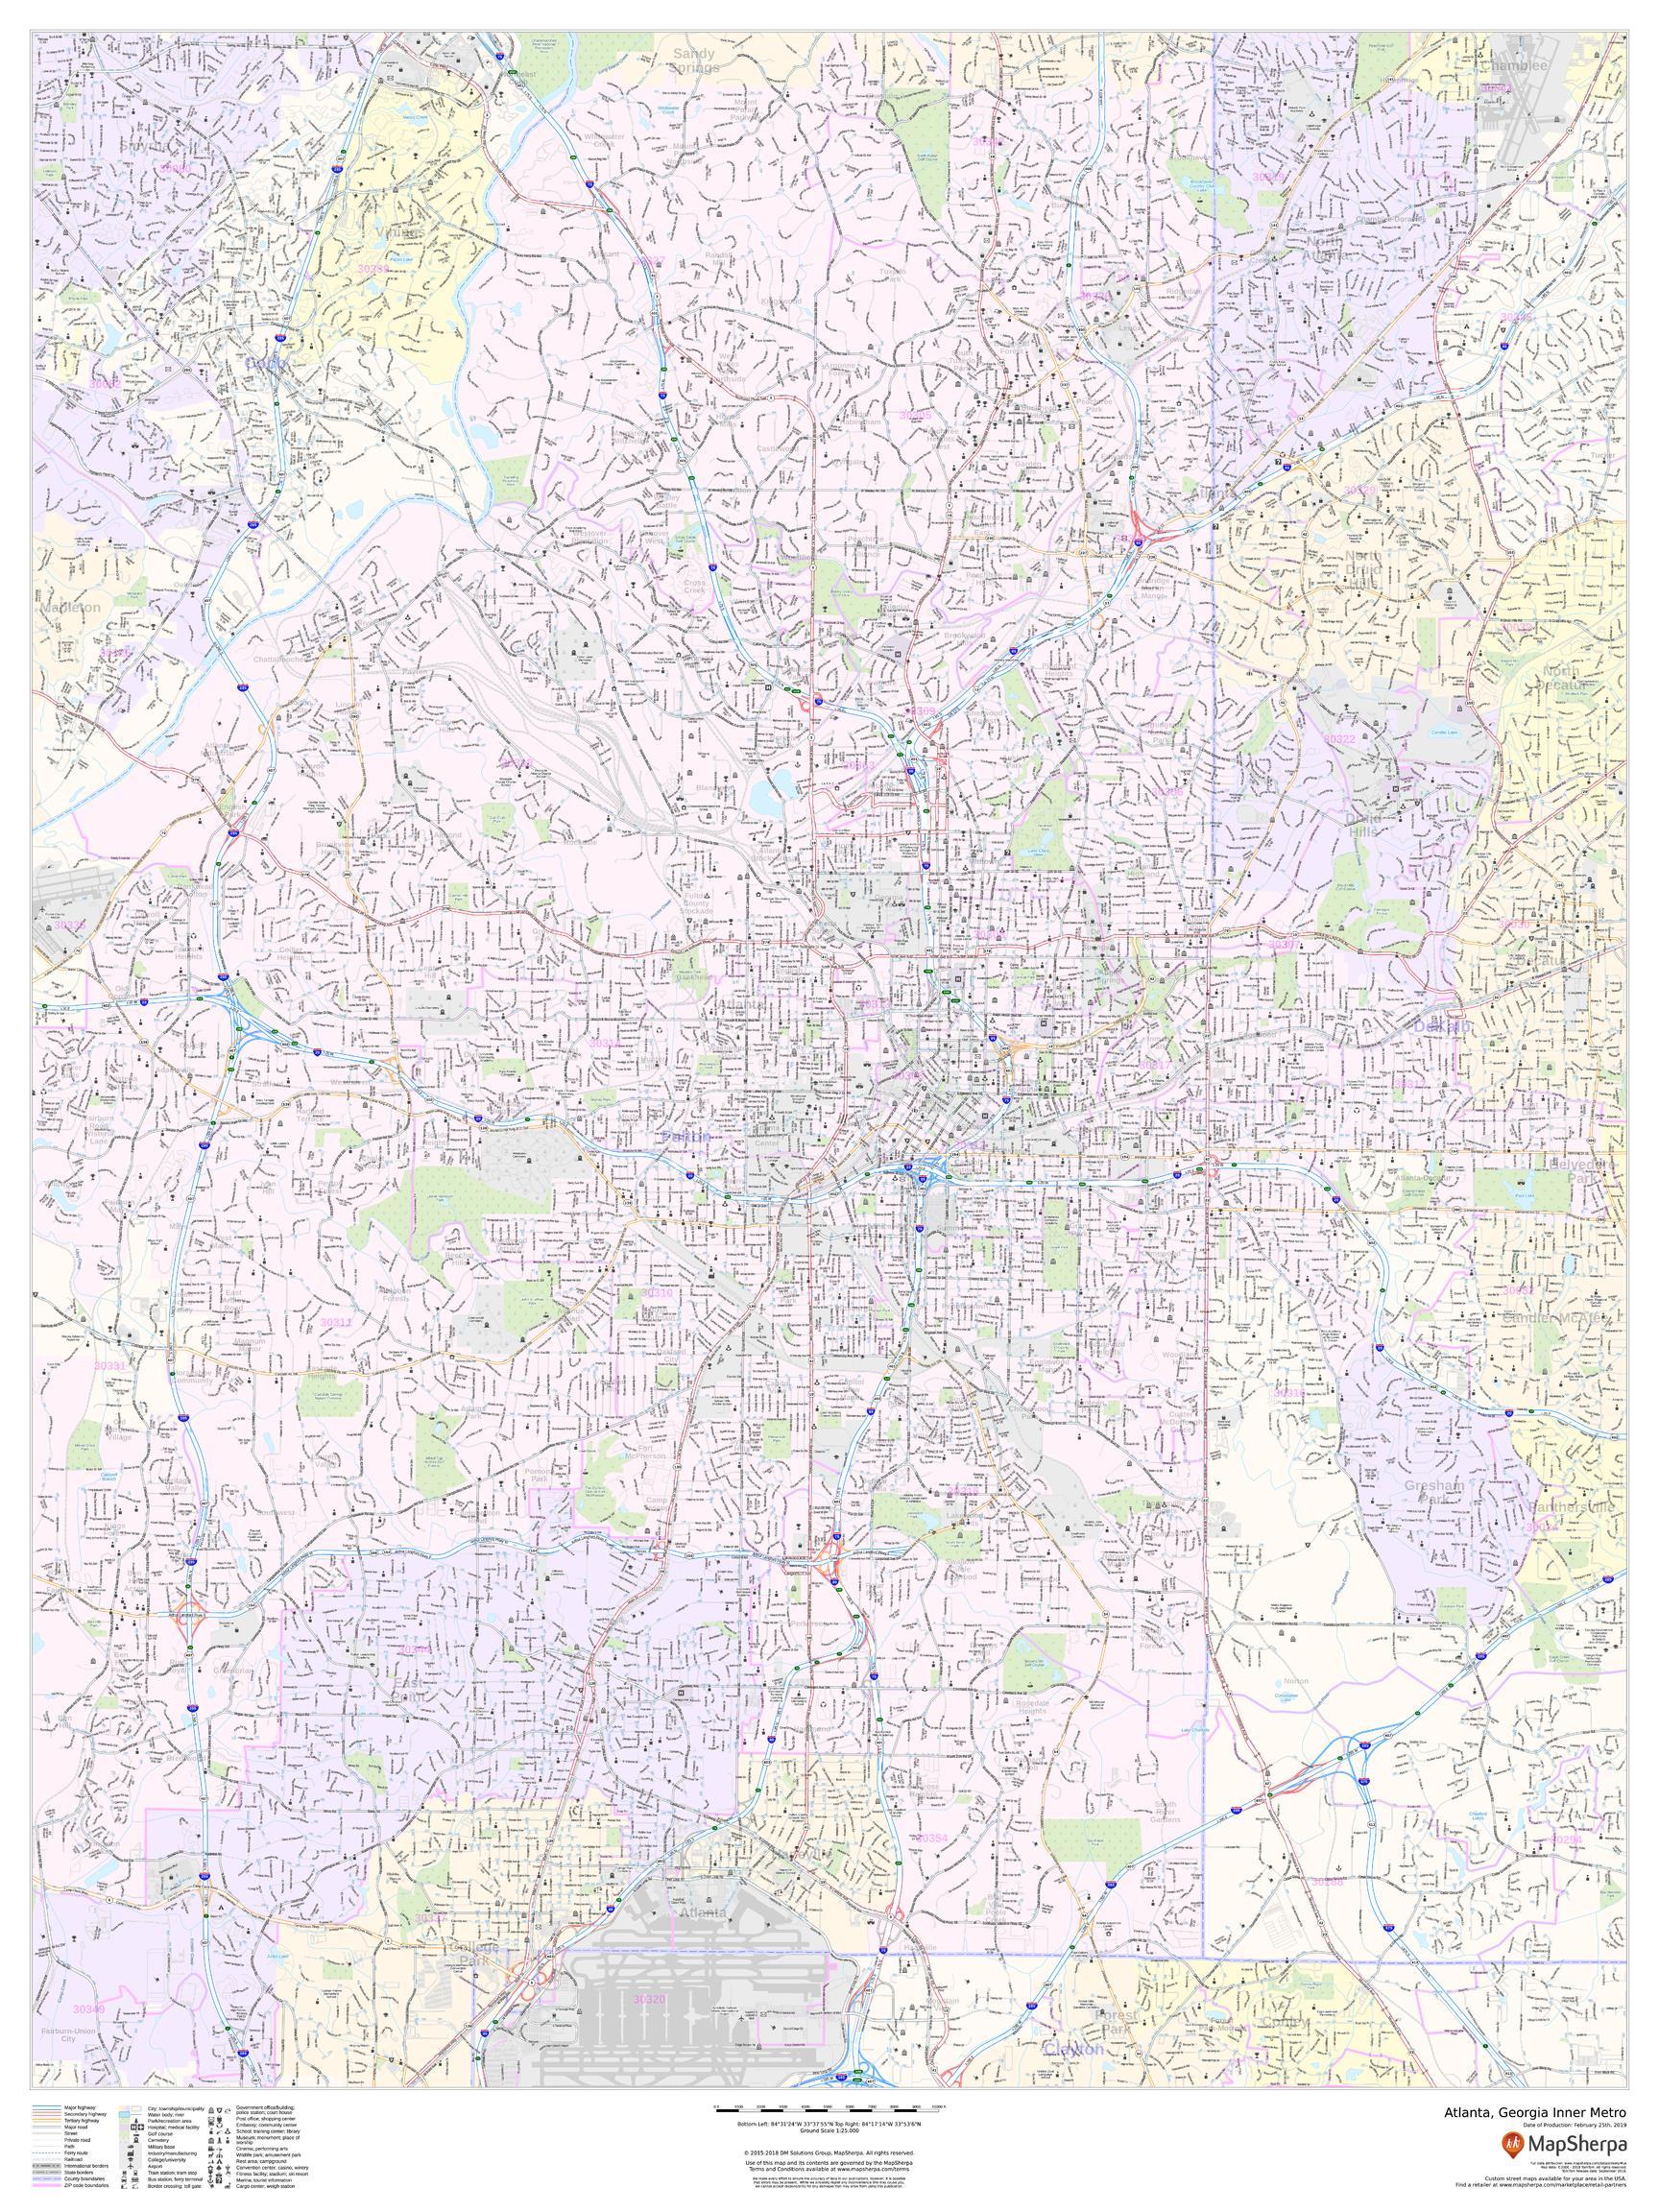 Atlanta, Georgia Inner Metro - Portrait Map